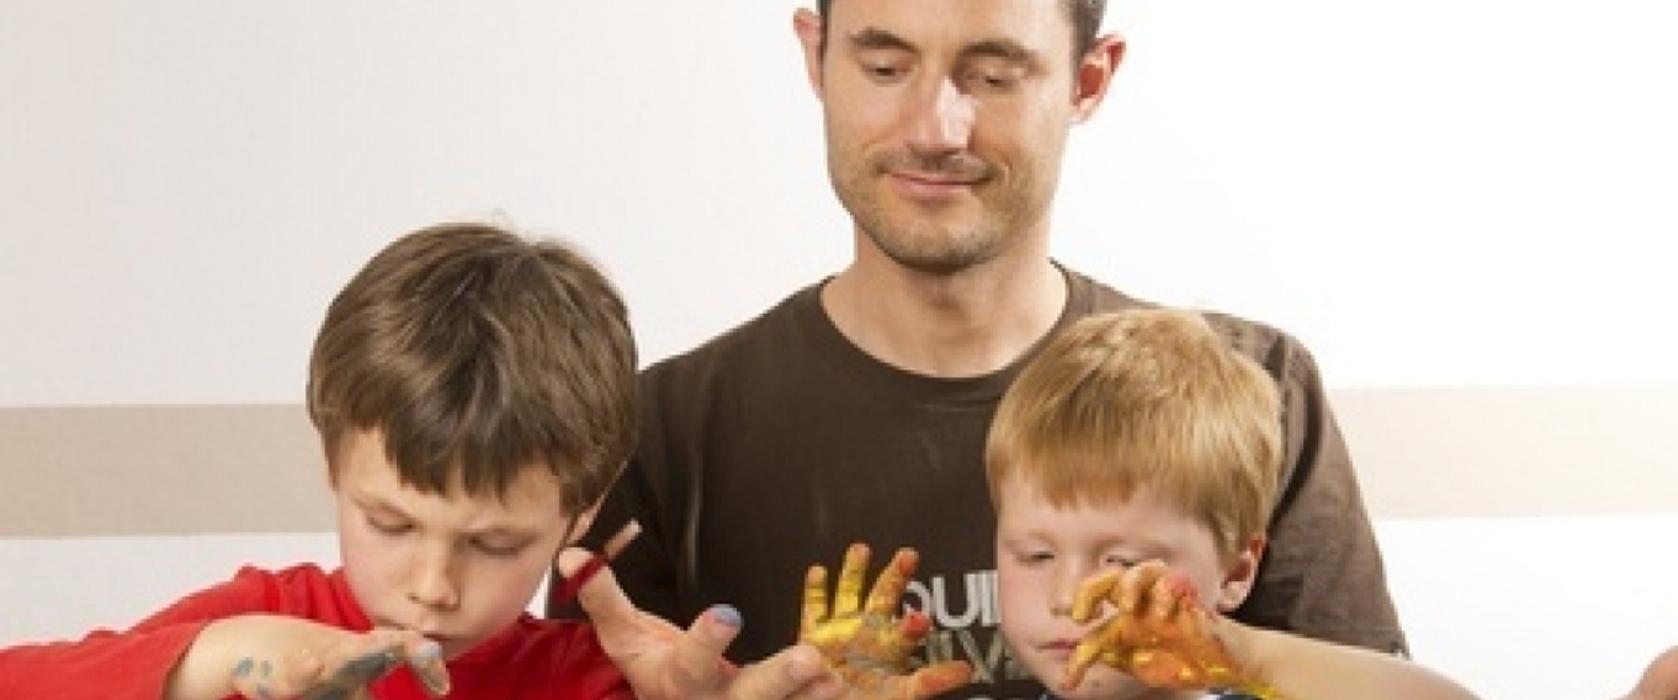 MinicursoTDAH: Bases de la actuación familiar para ser un modelo